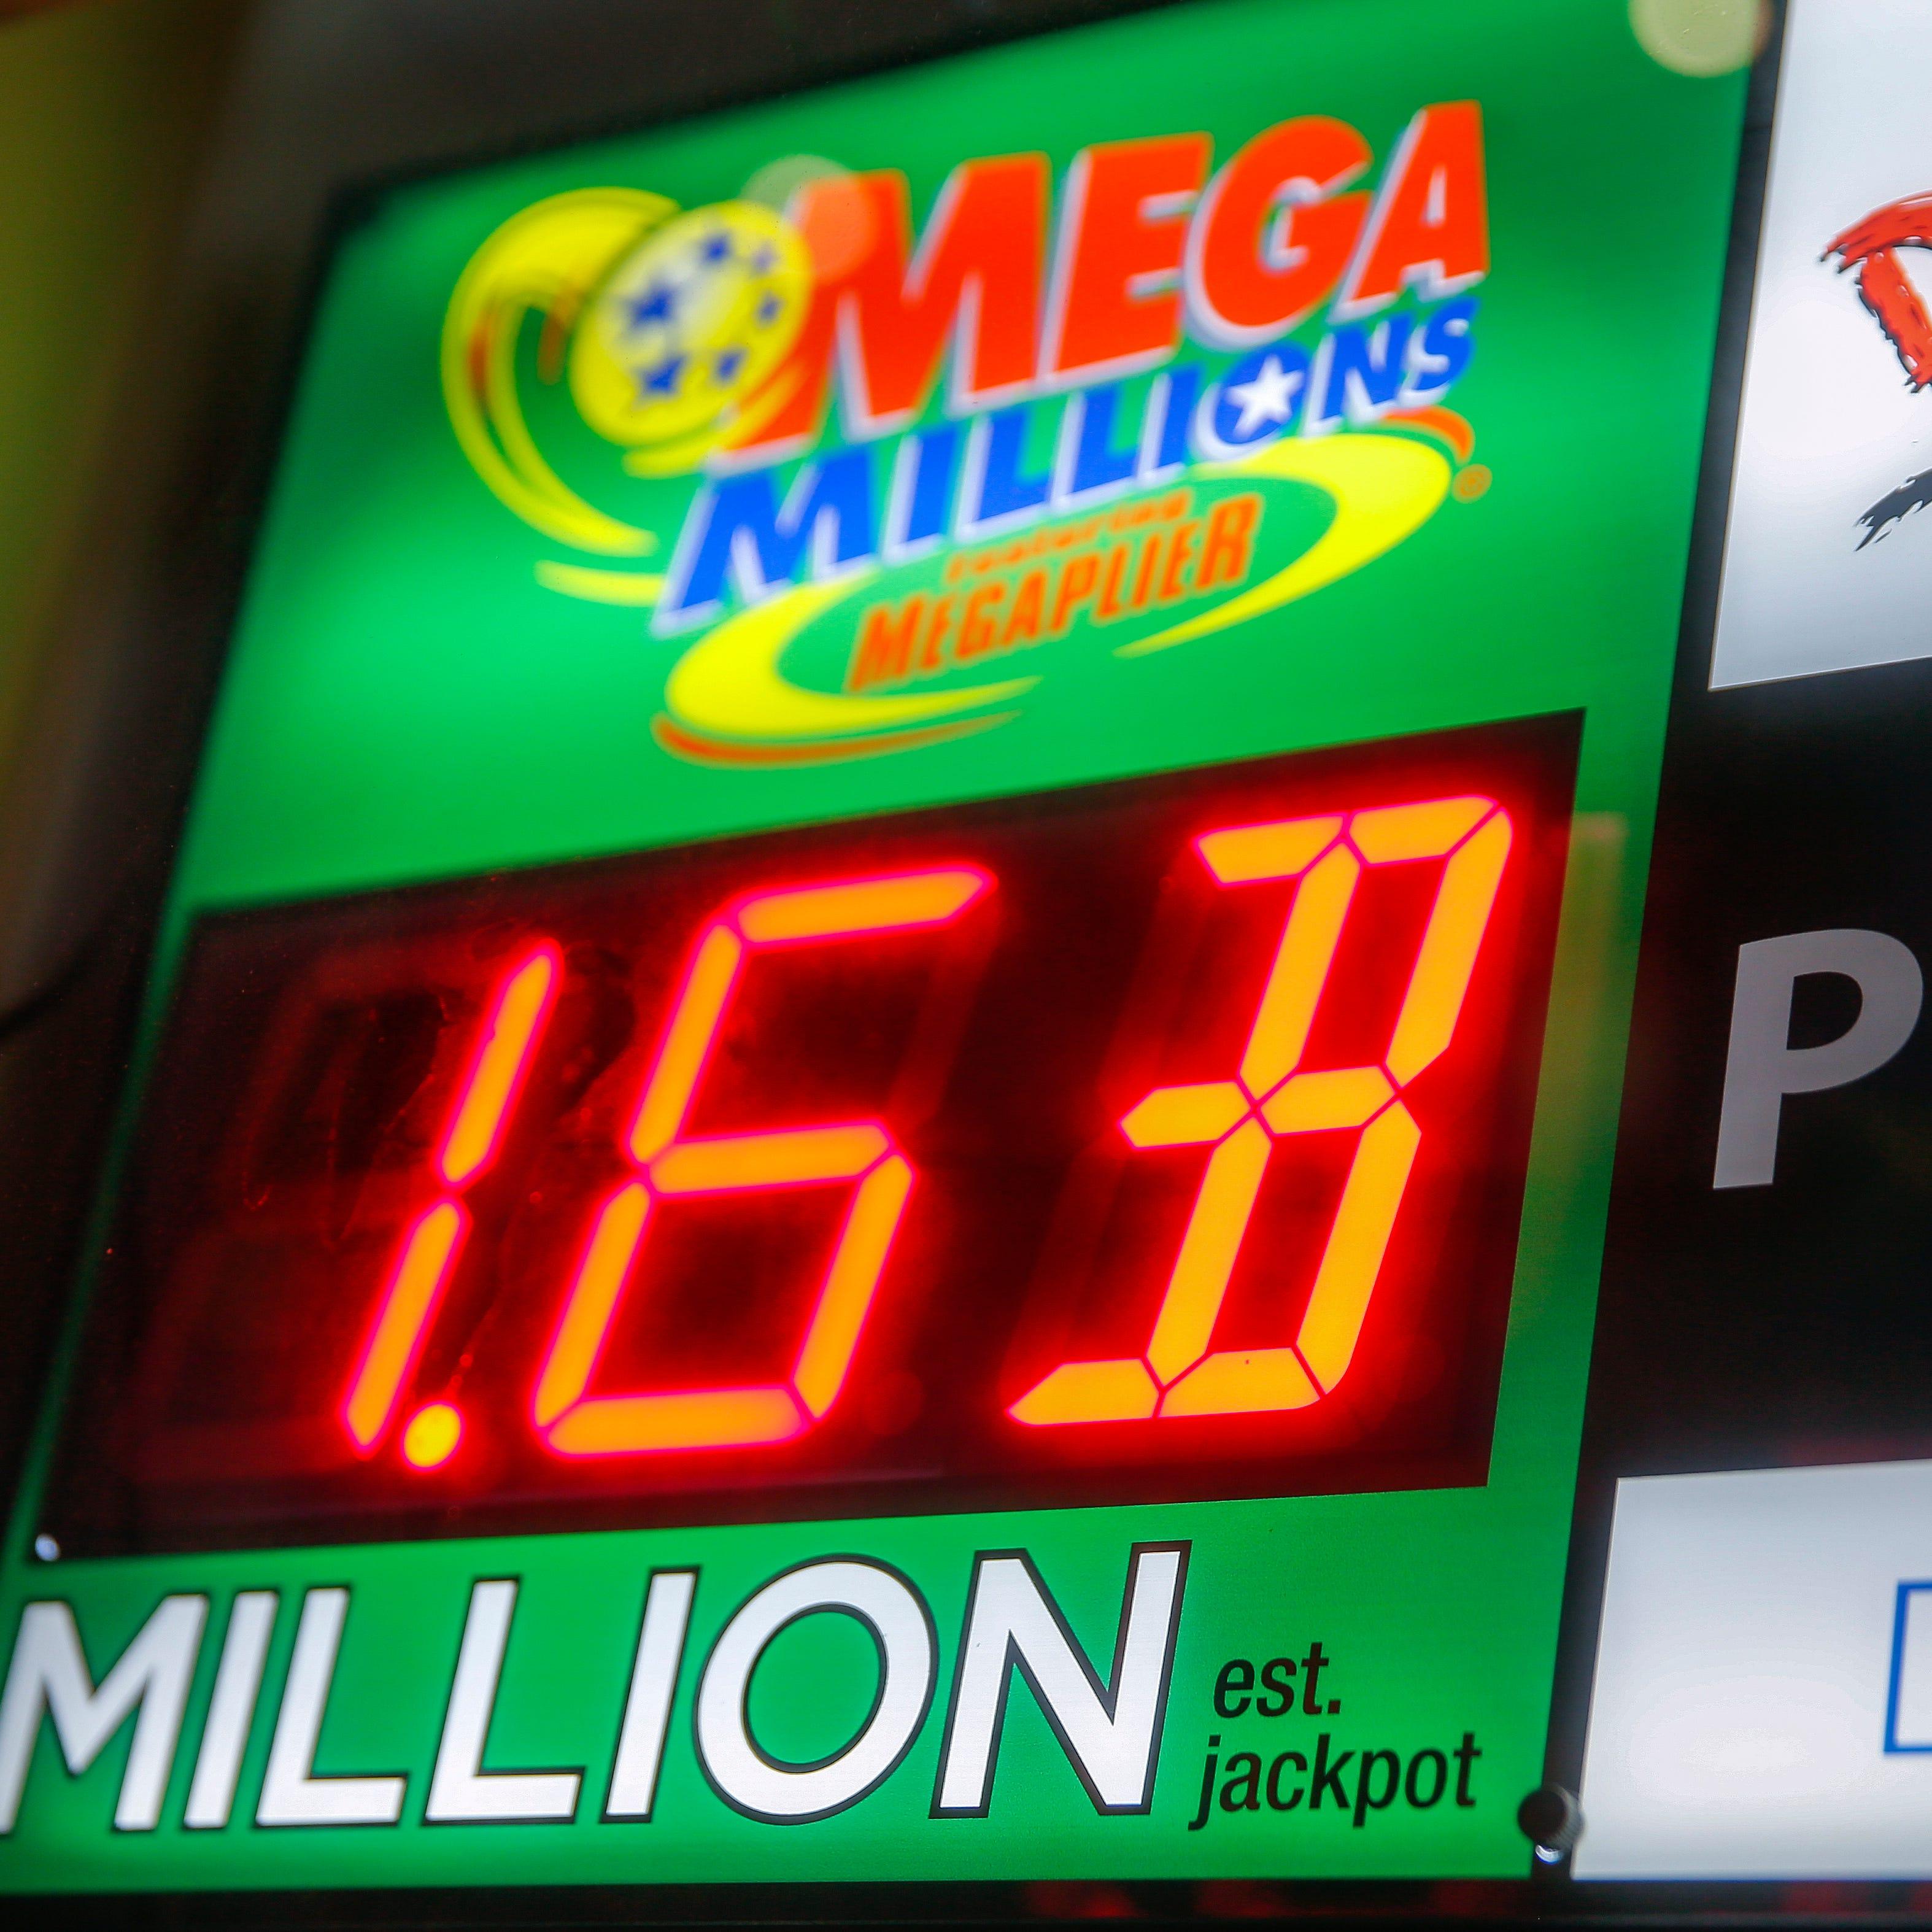 Mega Millions jackpot has increased again, prolonging lottery fever